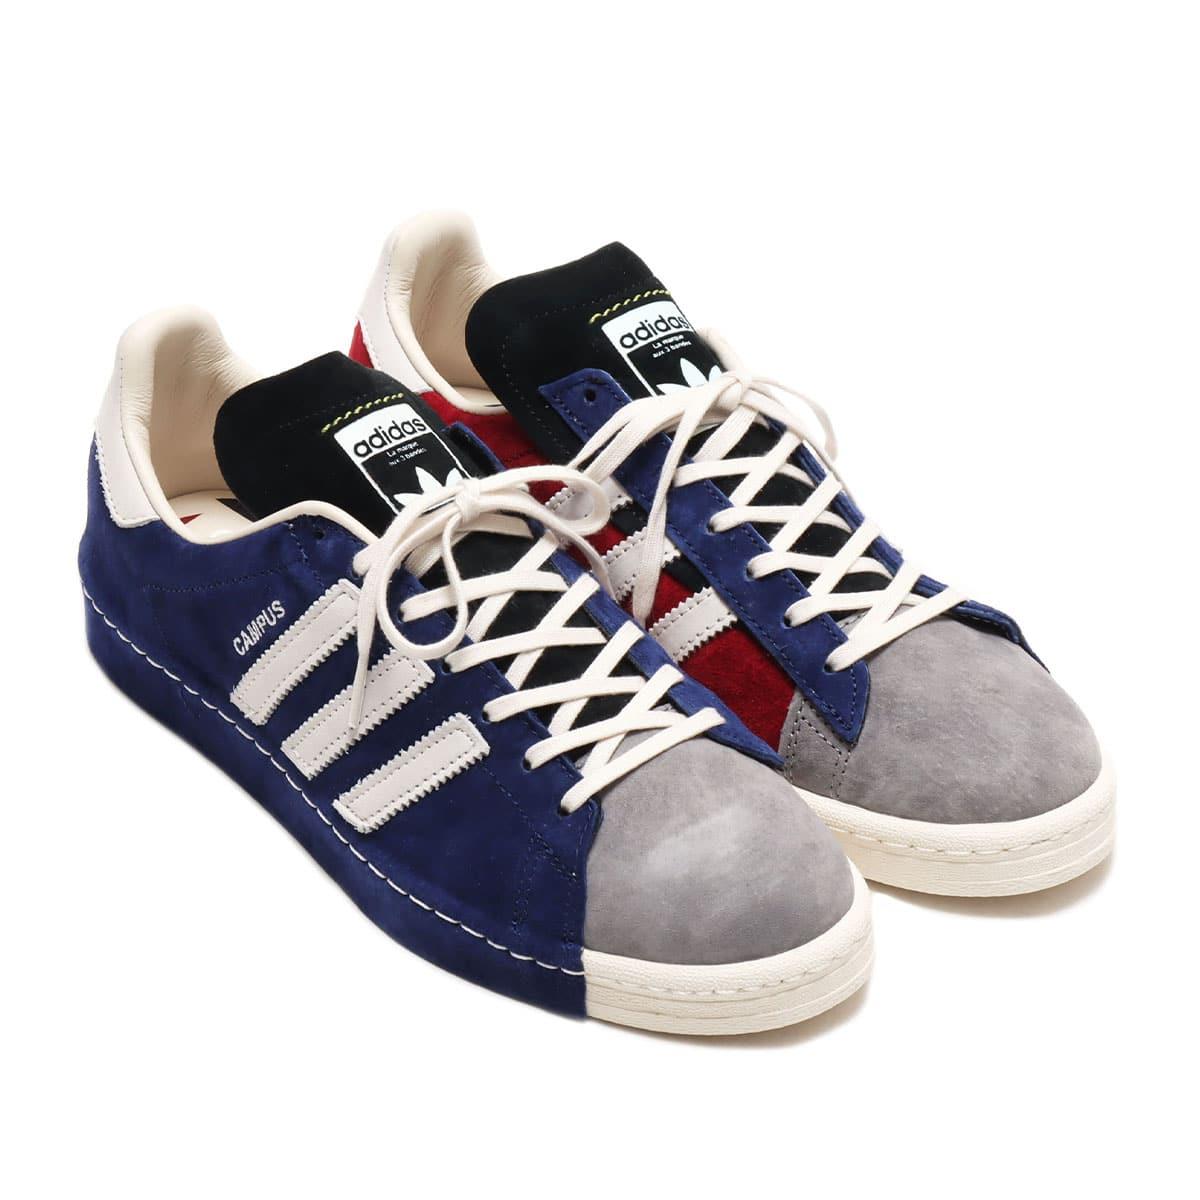 adidas CAMPUS 80S SH DARK BLUE/CHALK